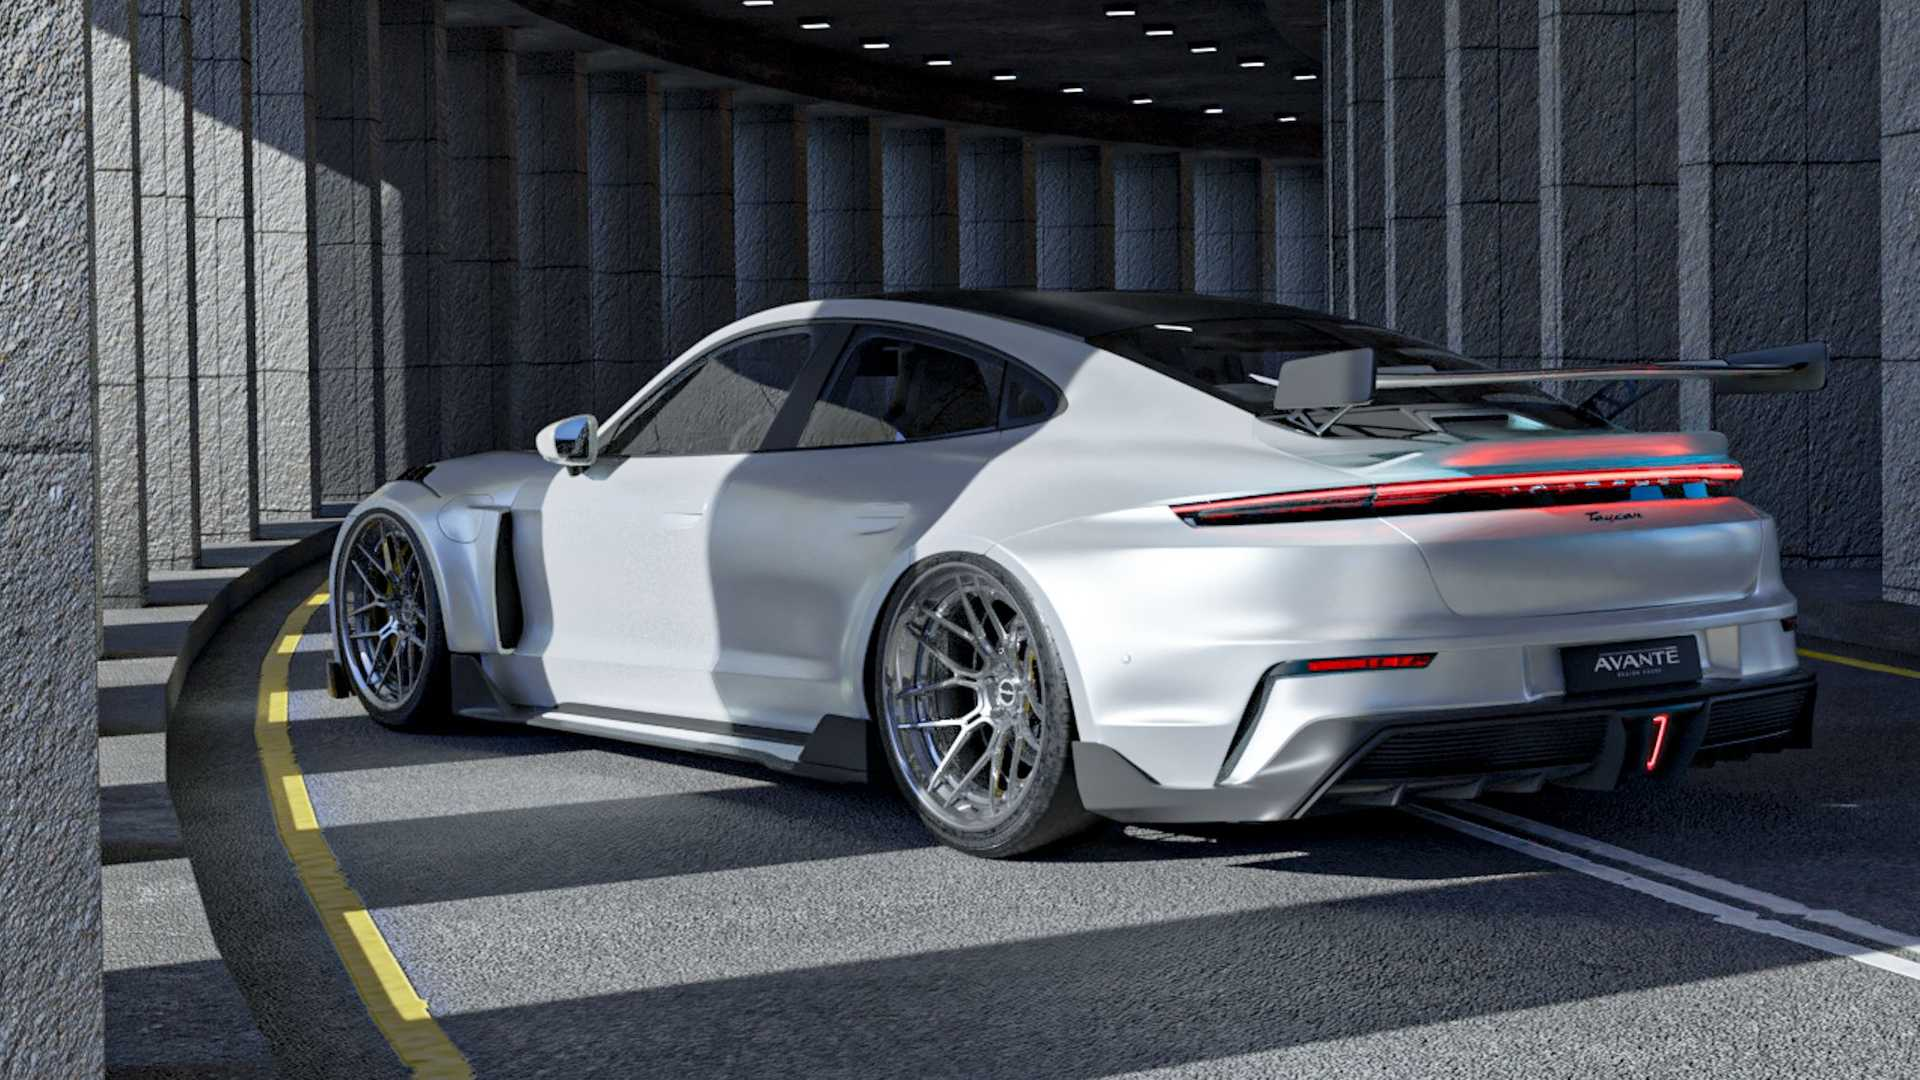 Porsche-Taycan-by-Avante-Design-8